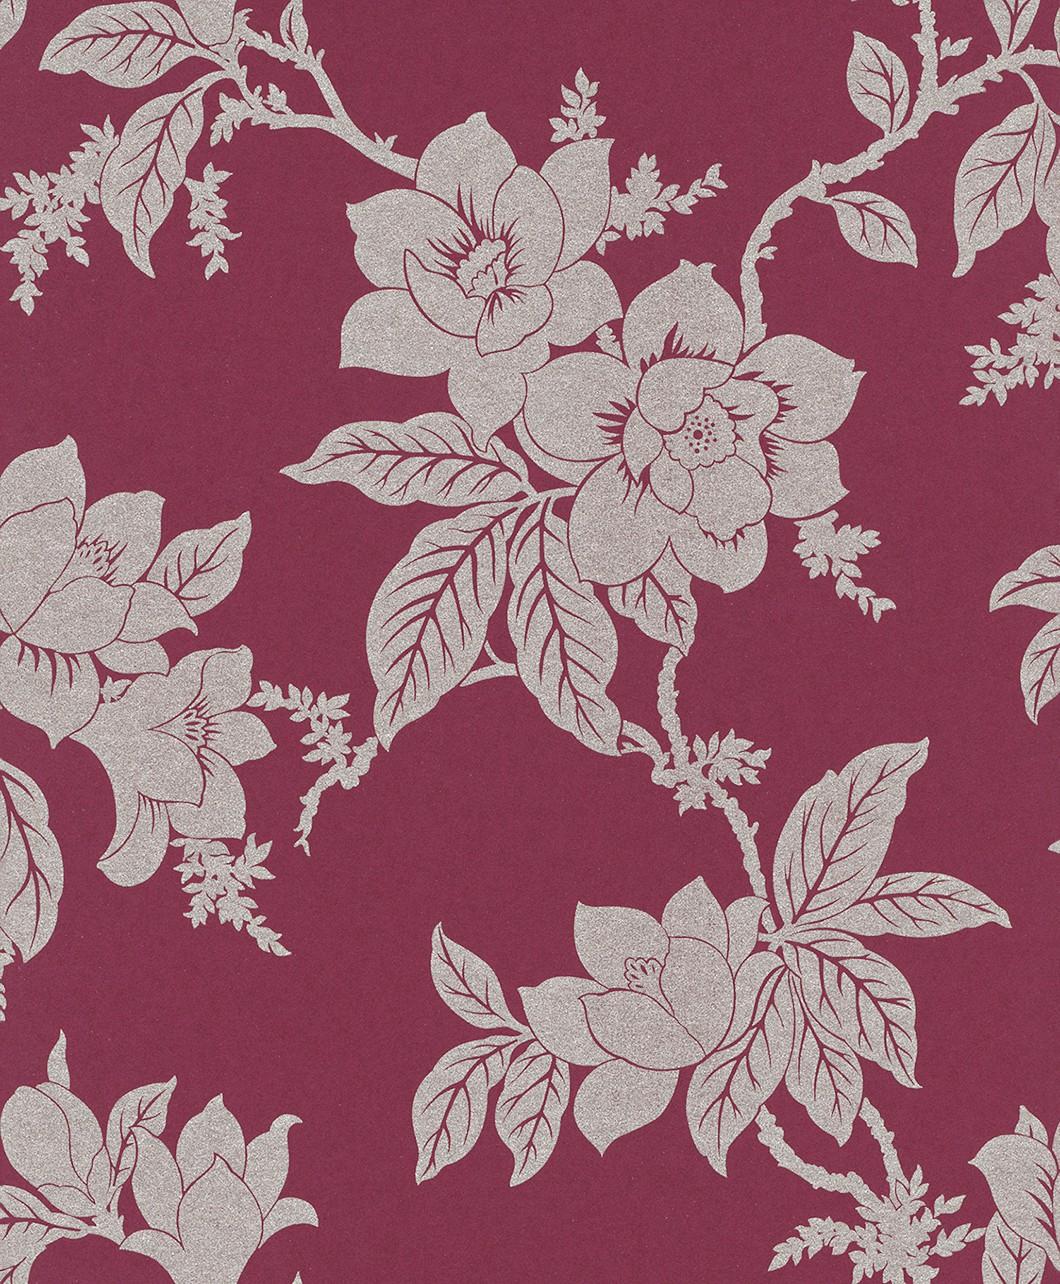 Vliestapete  Floral  bordeaux  rot  silber  Tapete - Tapete Bordeaux